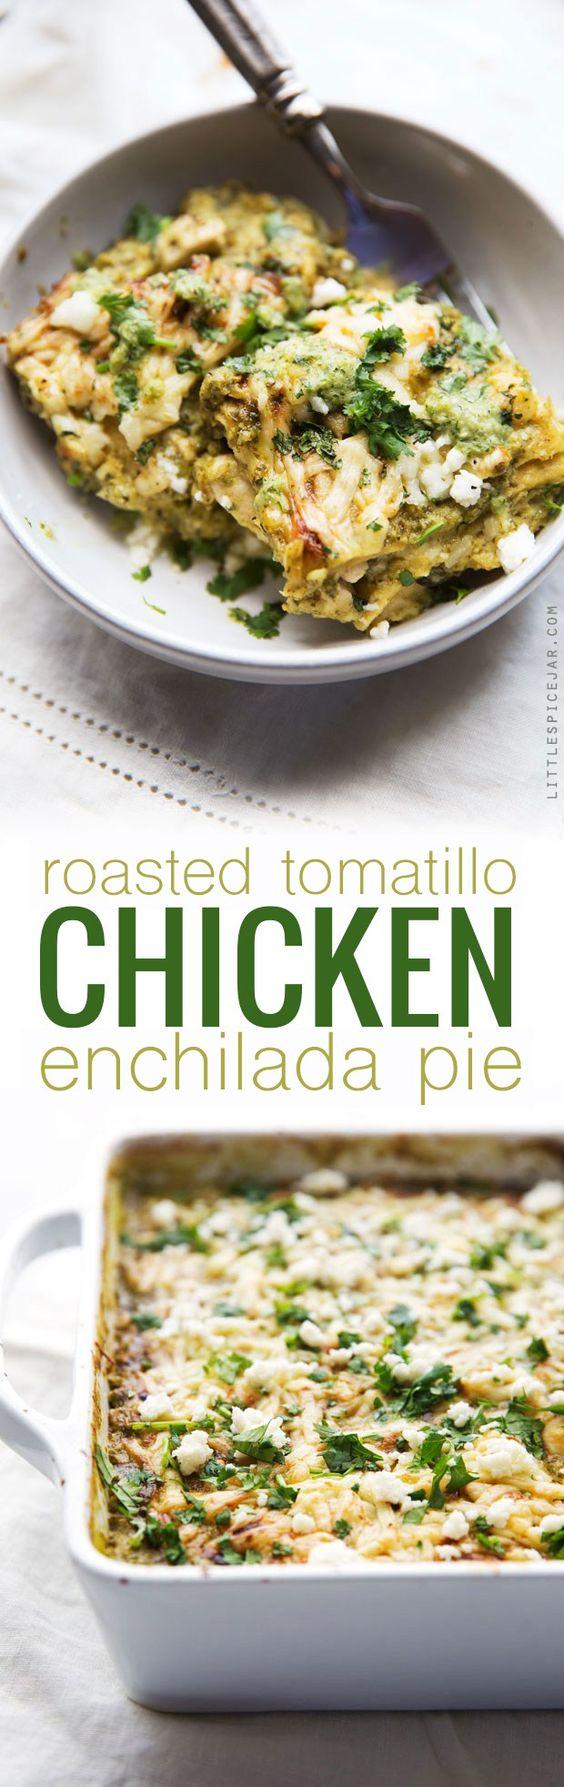 Roasted Tomatillo Chicken Enchilada Pie - A simple homemade tomatillo cream…